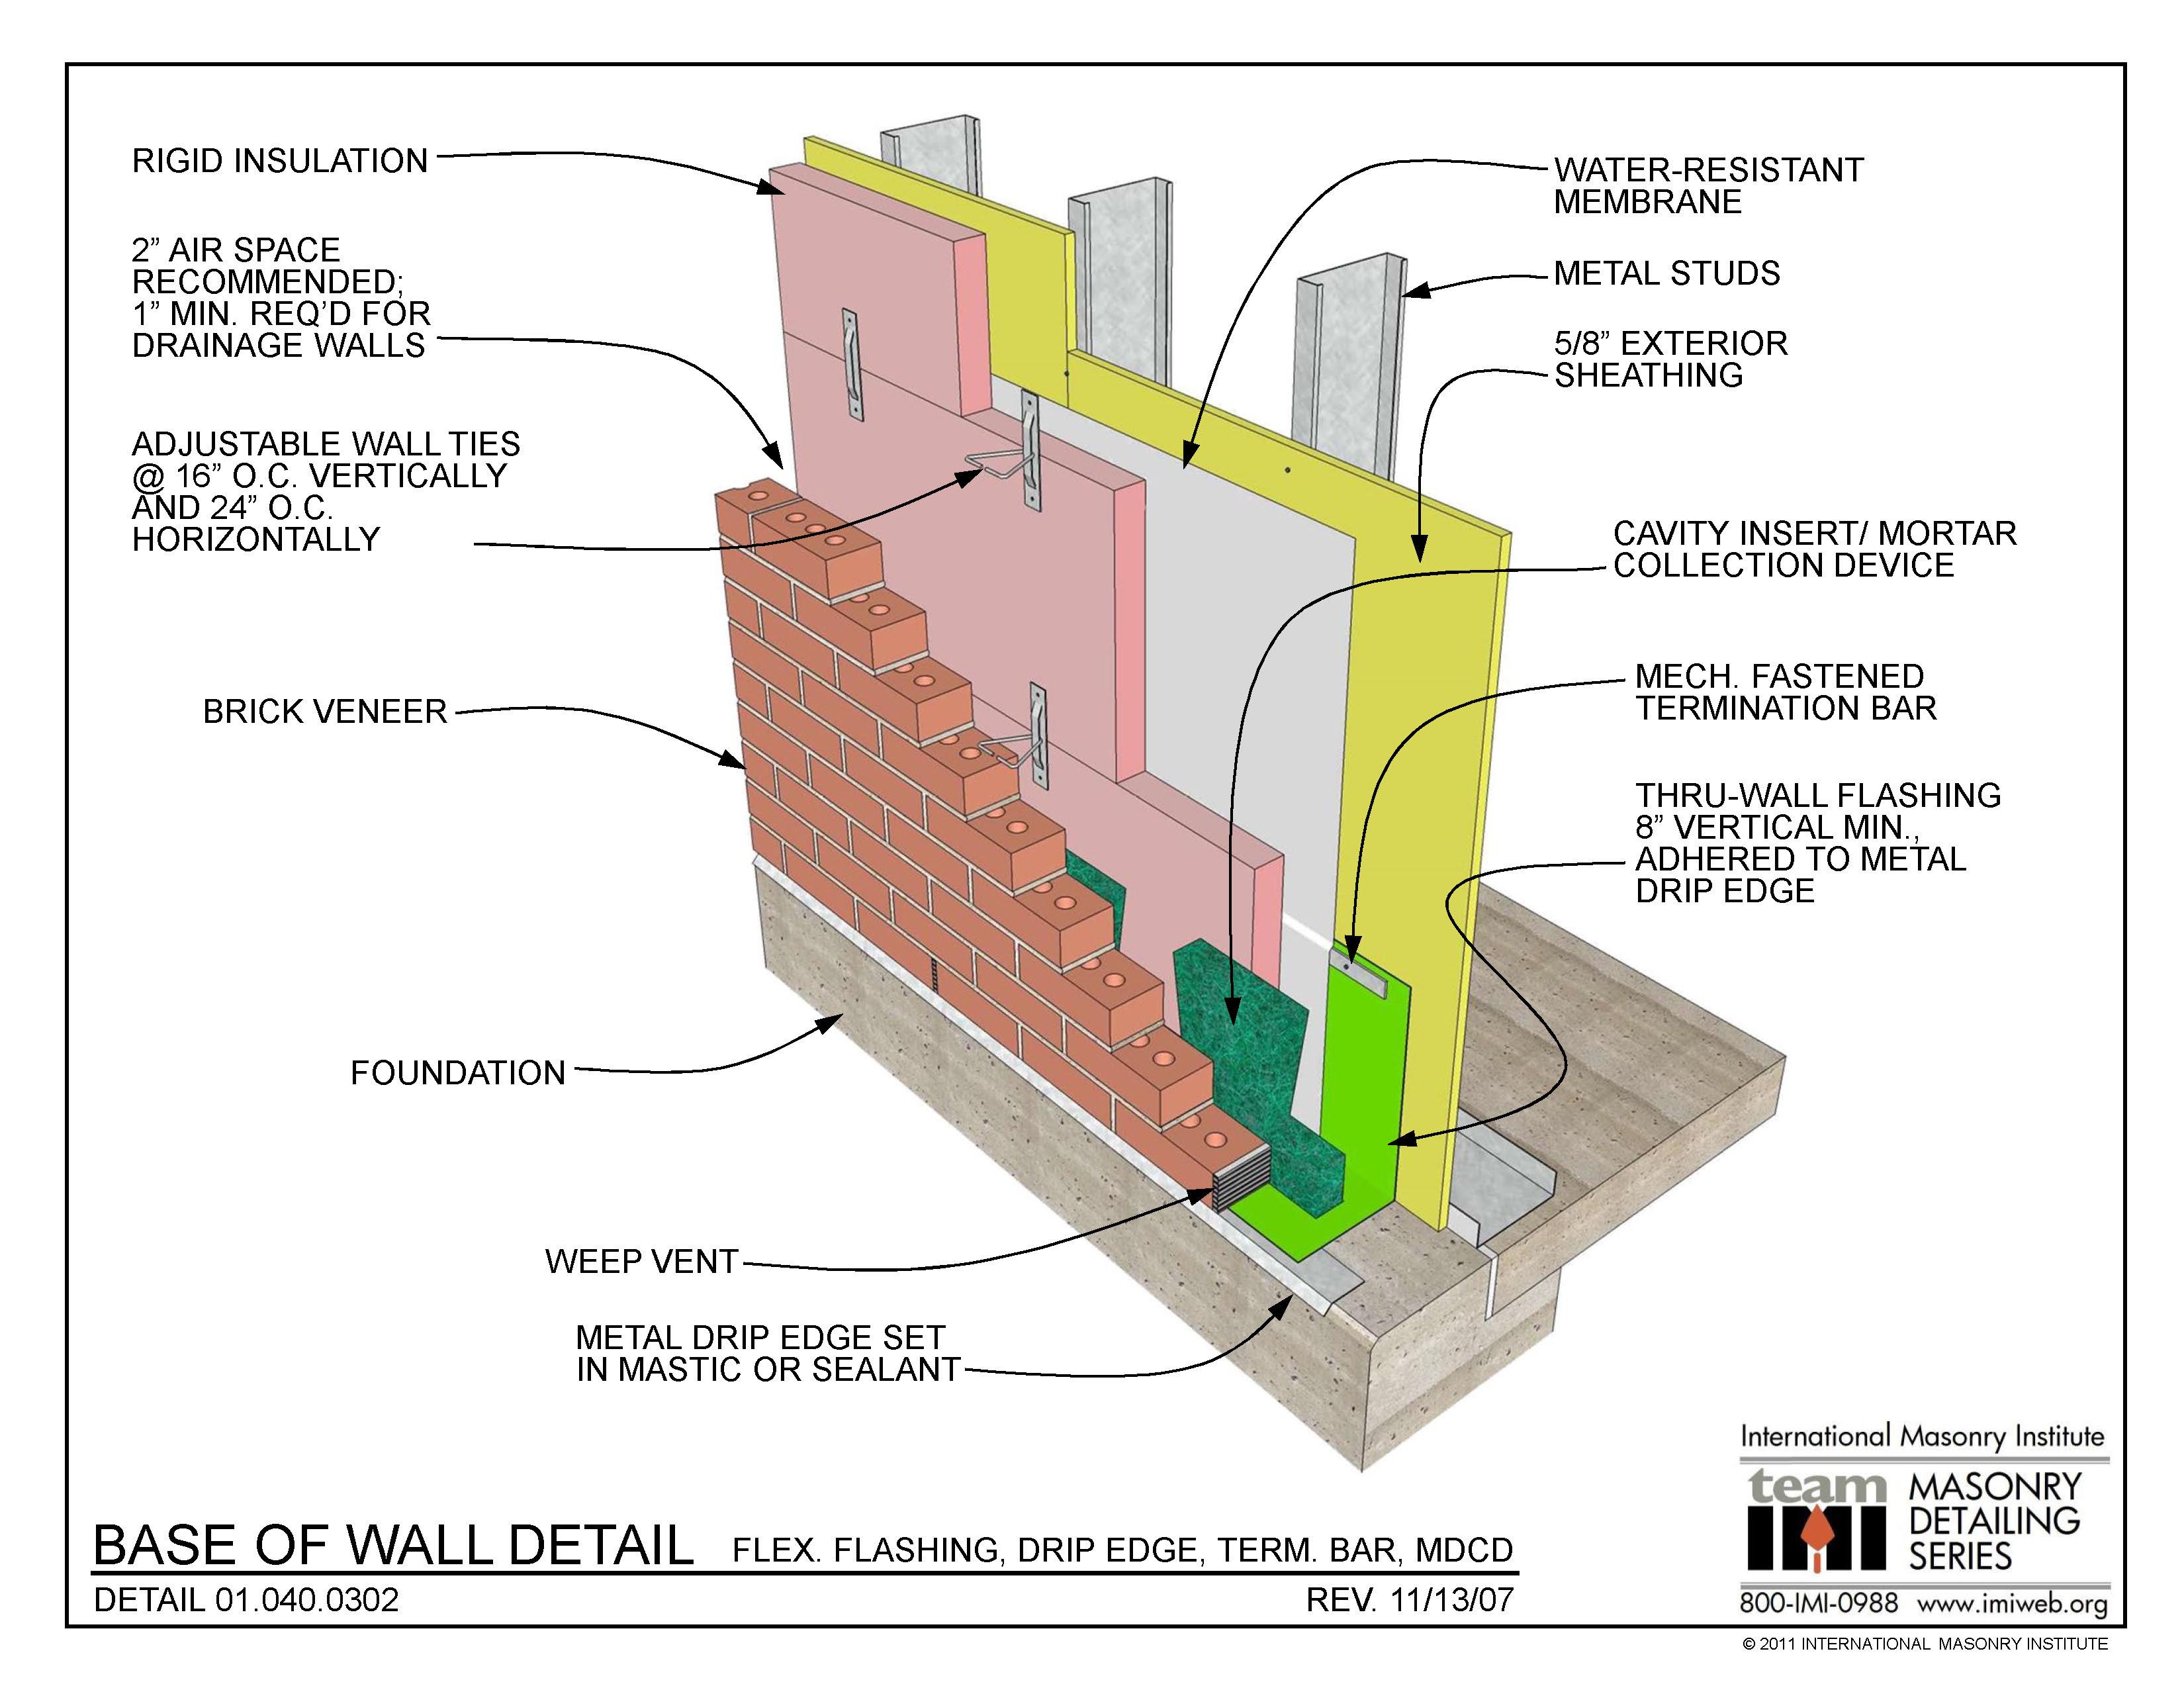 01 040 0302 Base Of Wall Detail Flex Flashing Drip